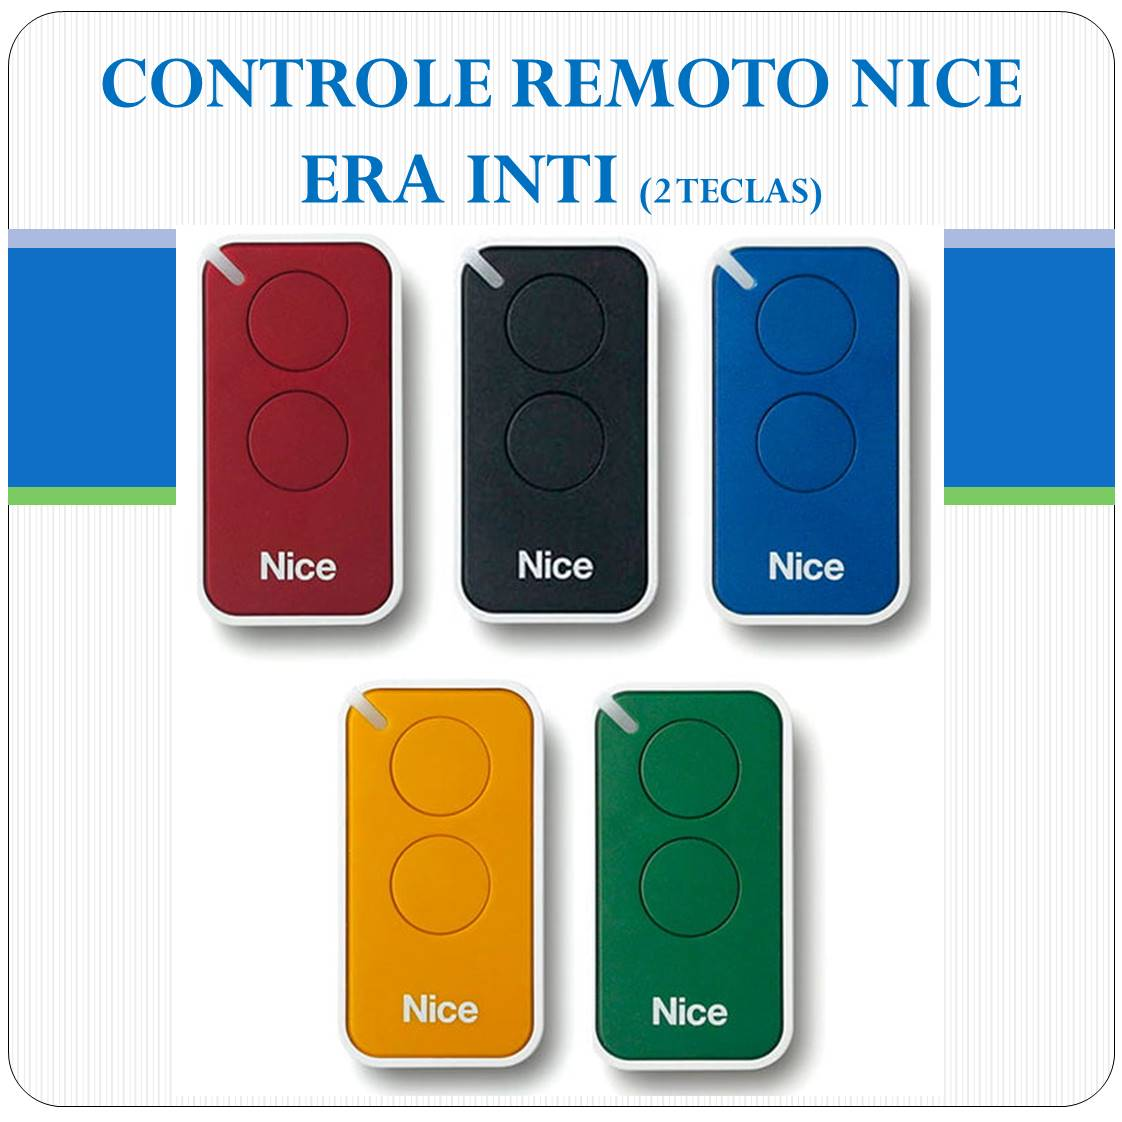 Controle Remoto NICE ERA INTI - 2 teclas